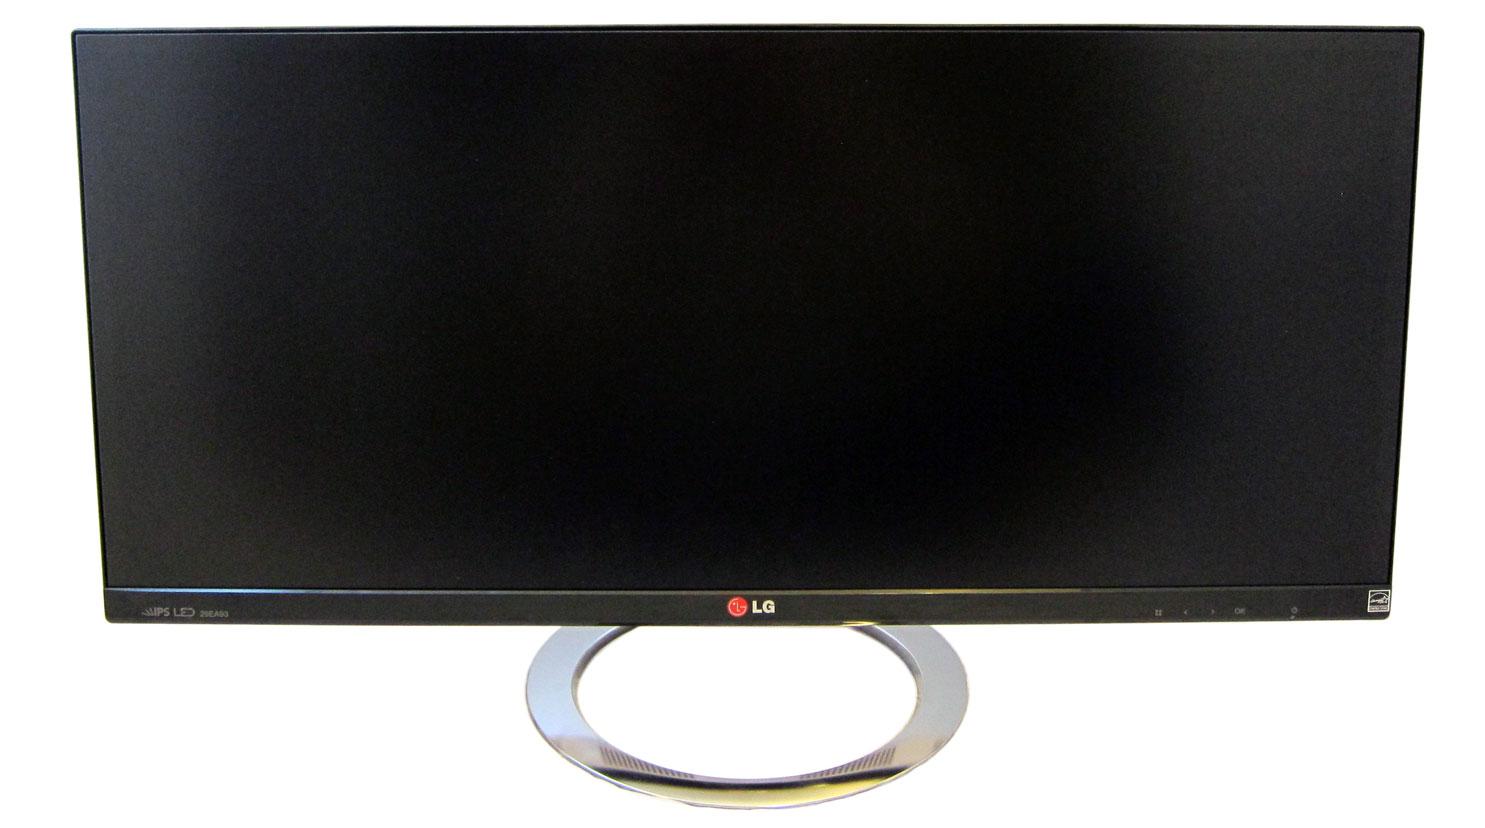 LG 29EA93 Monitor Drivers for Windows 7